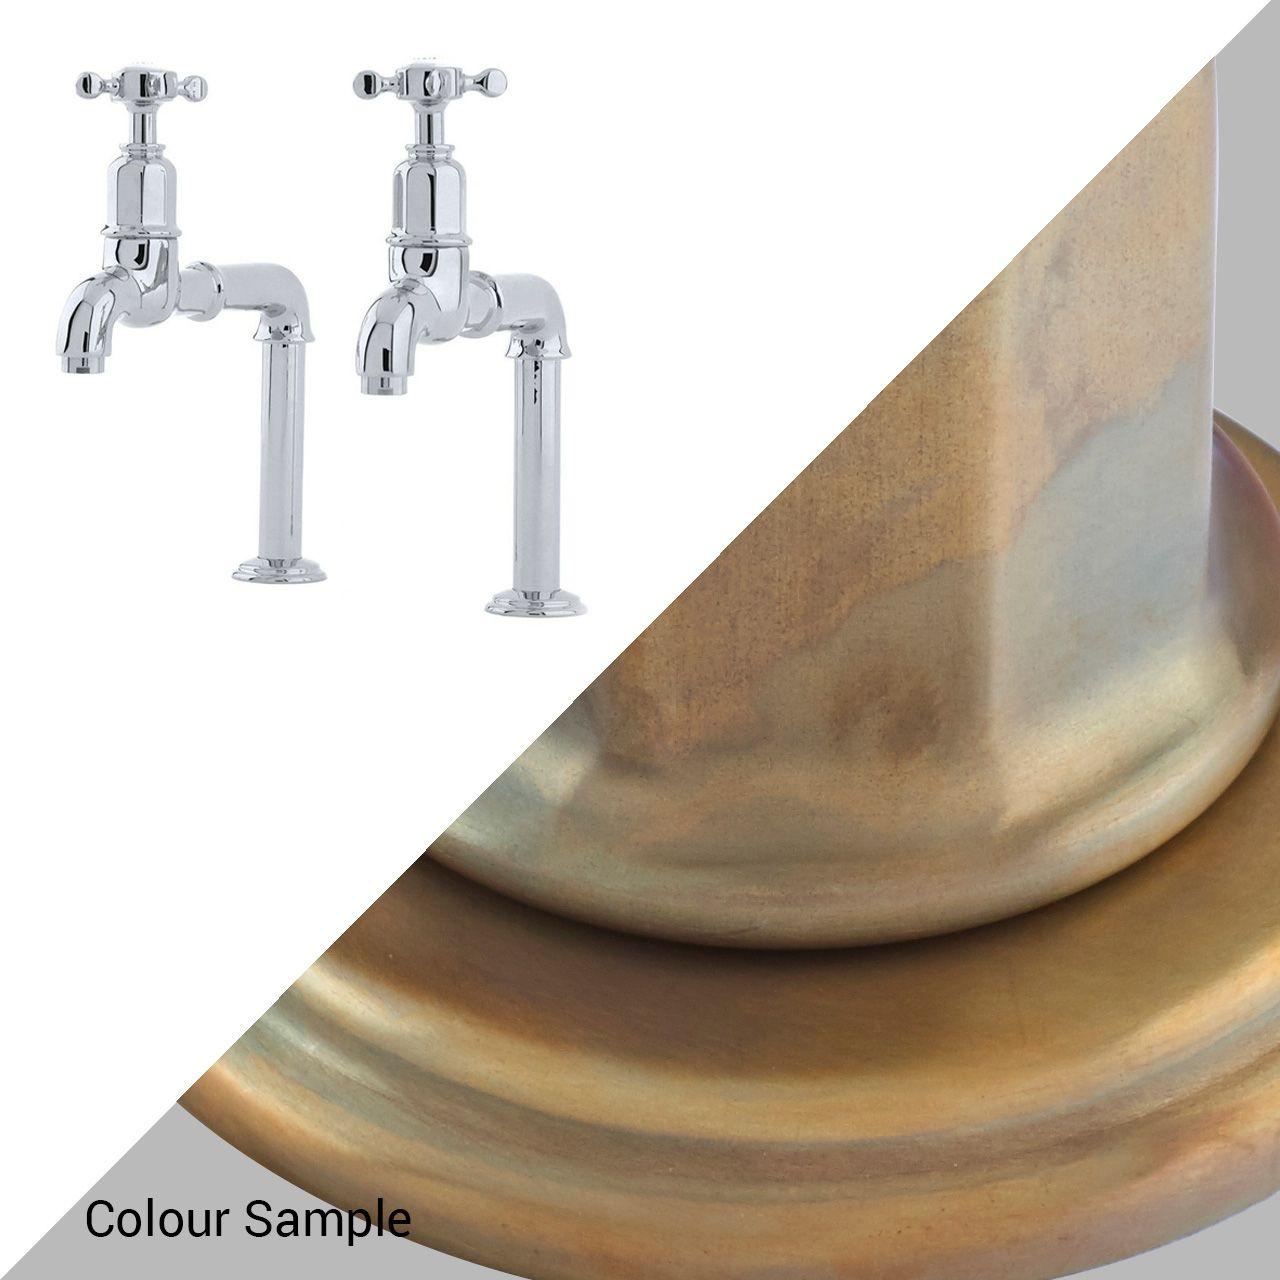 perrin and rowe 4338 mayan bibcock handle tap sinks taps com deck mounted mono mixer kitchen tap chrome Kitchen Mixer Taps